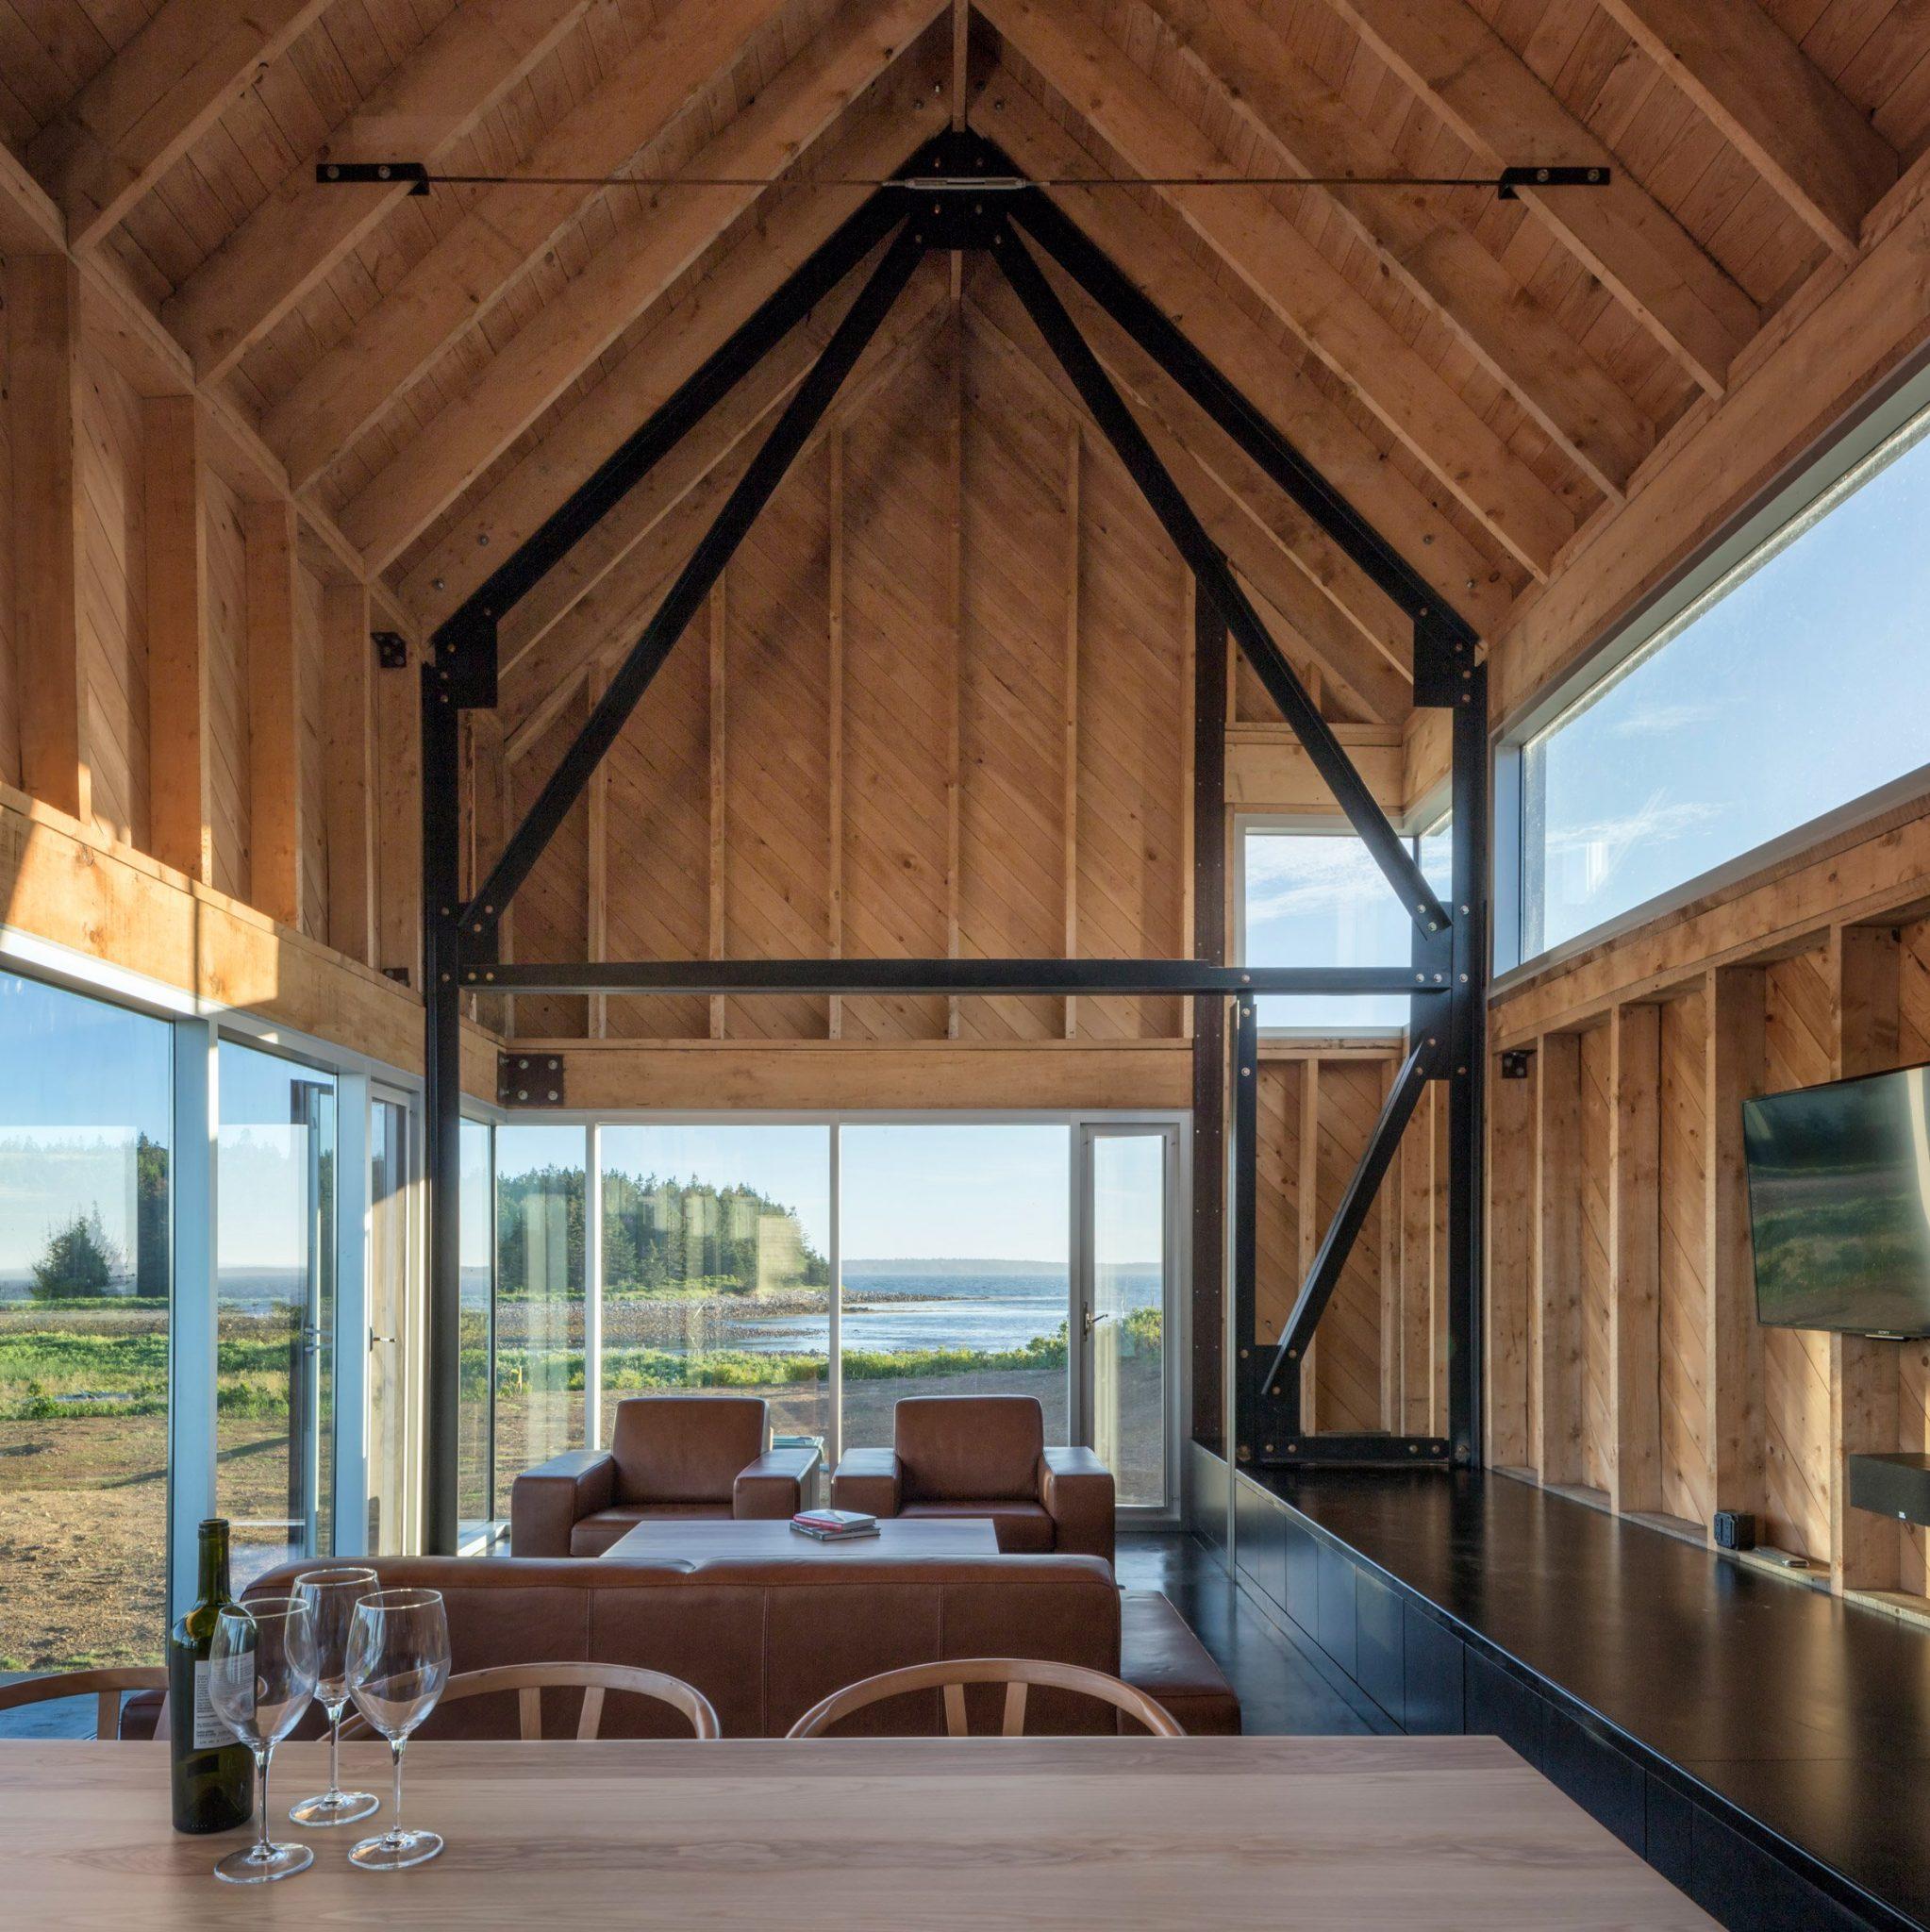 dreamy coastal house by studio mackay lyons sweetapple 7 Dreamy Coastal House by Studio MacKay Lyons Sweetapple